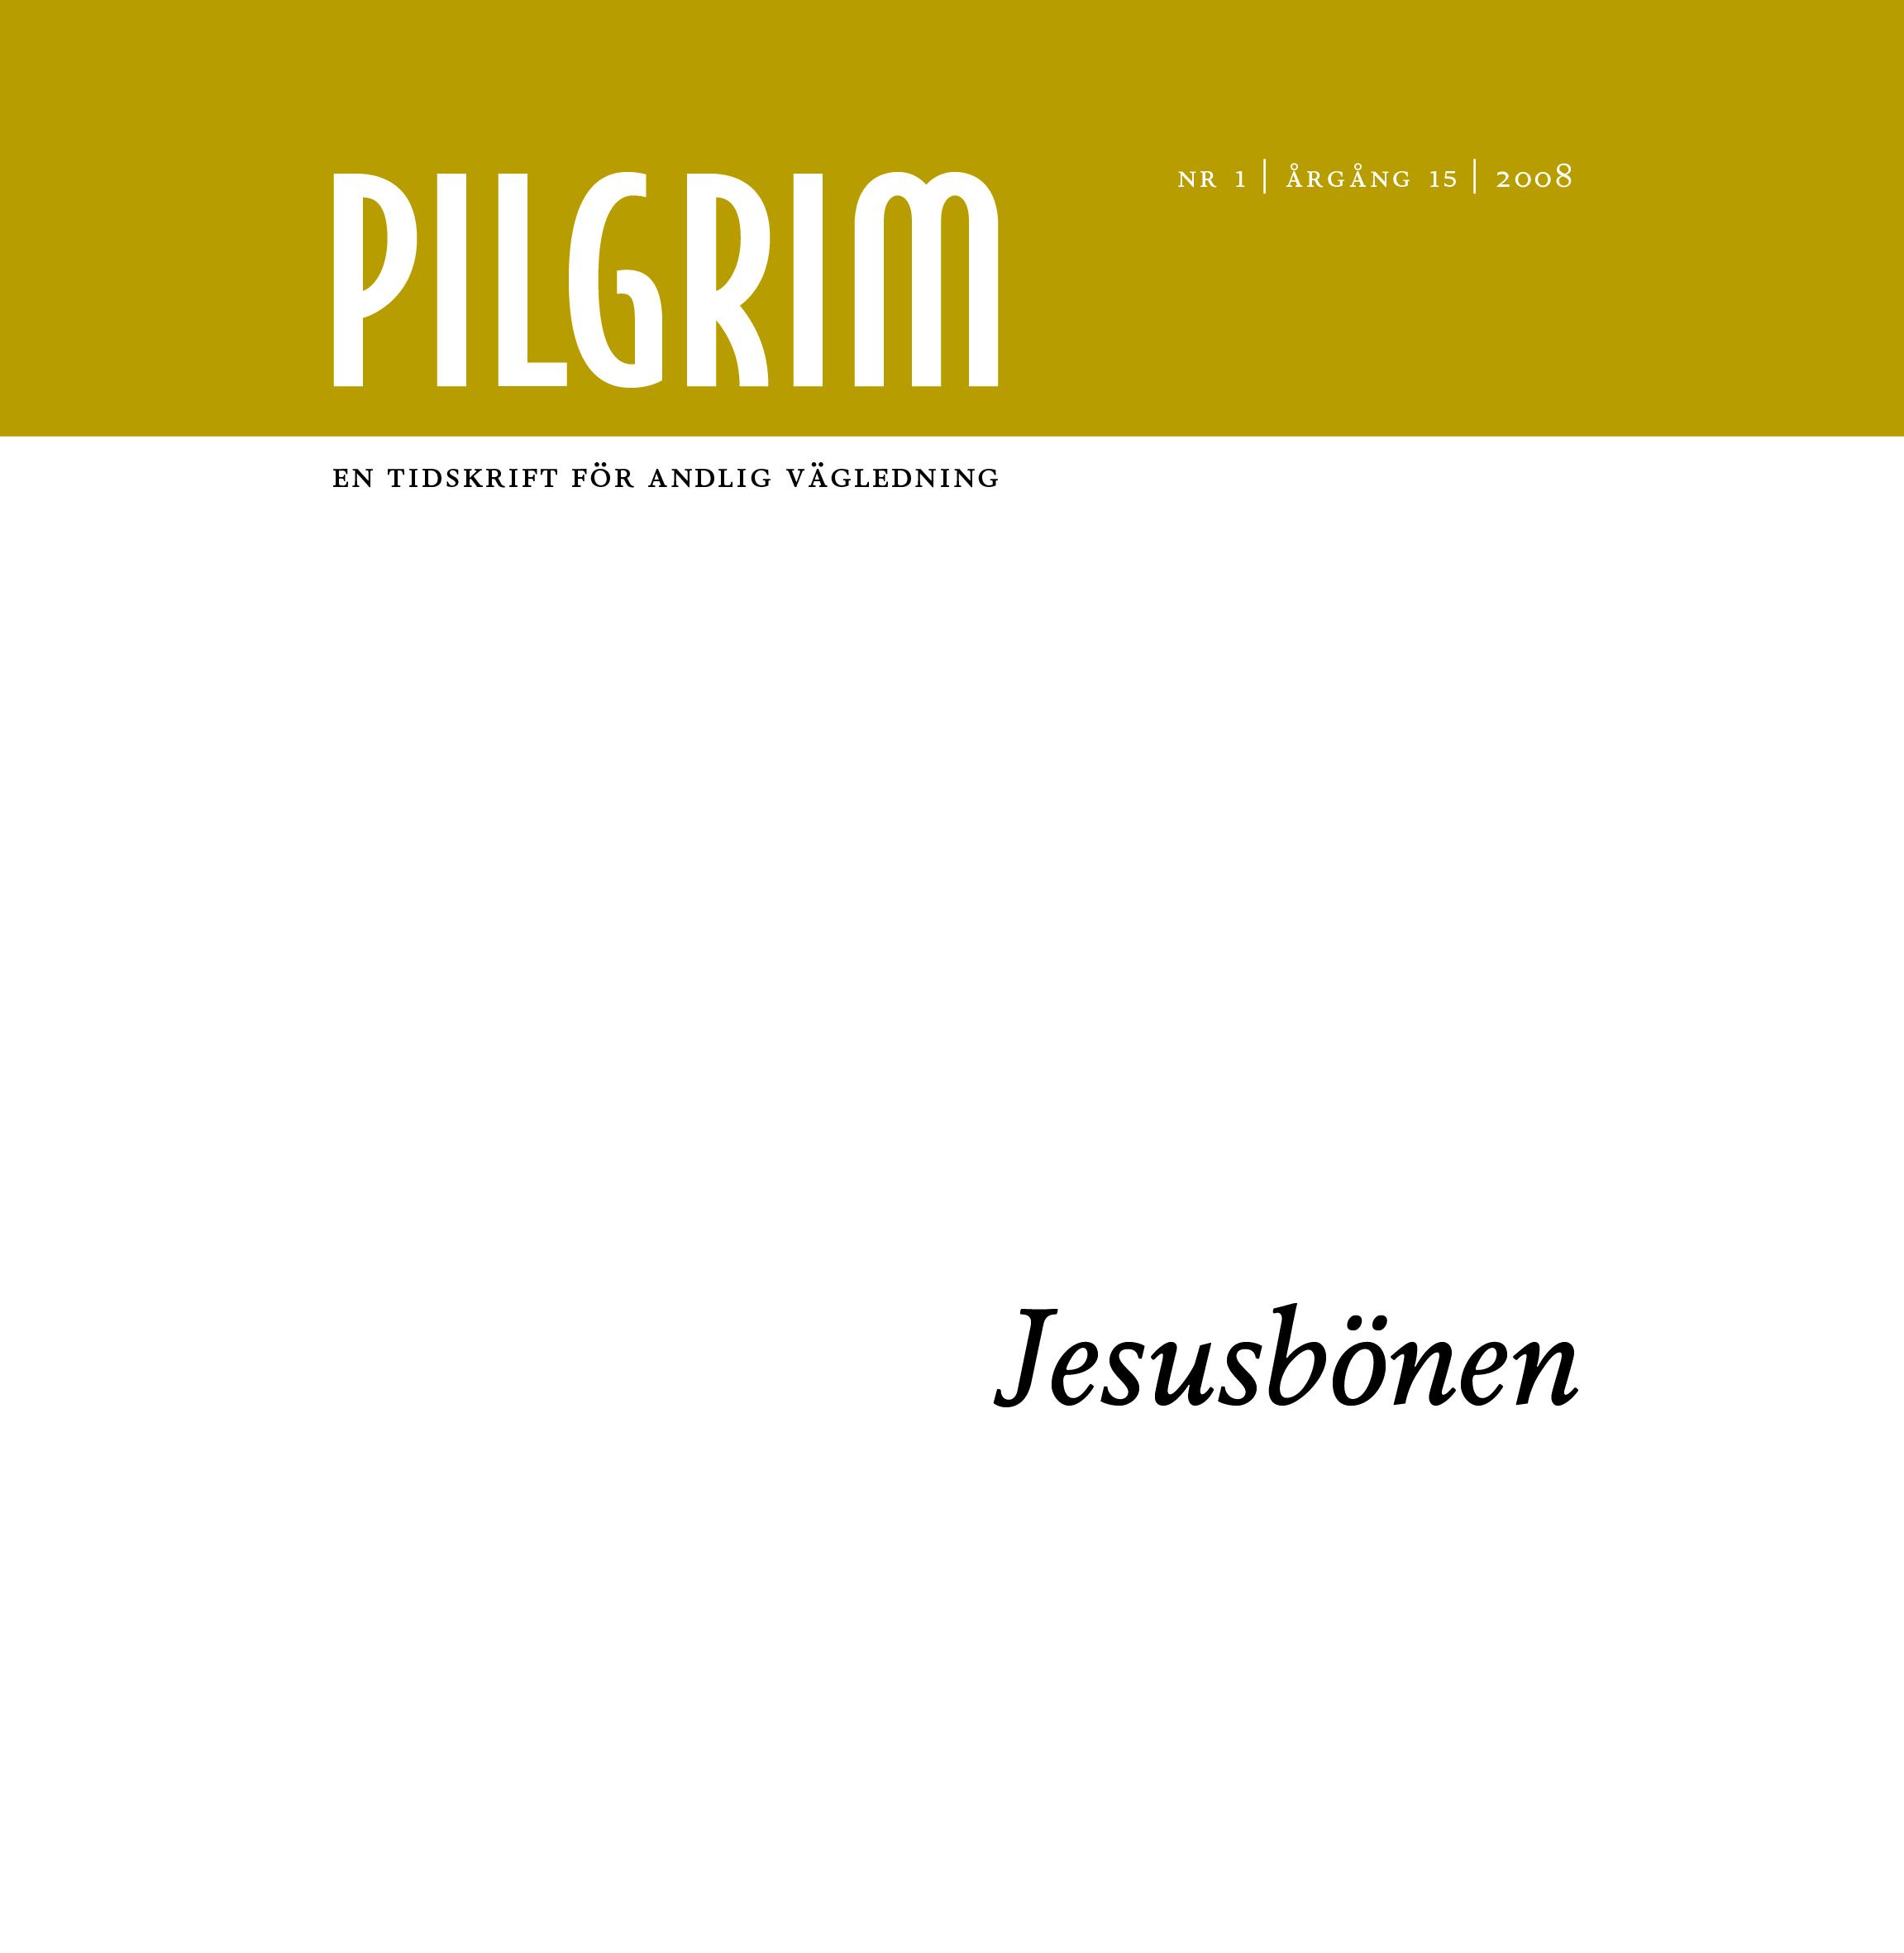 Pilgrim frams 2008-1